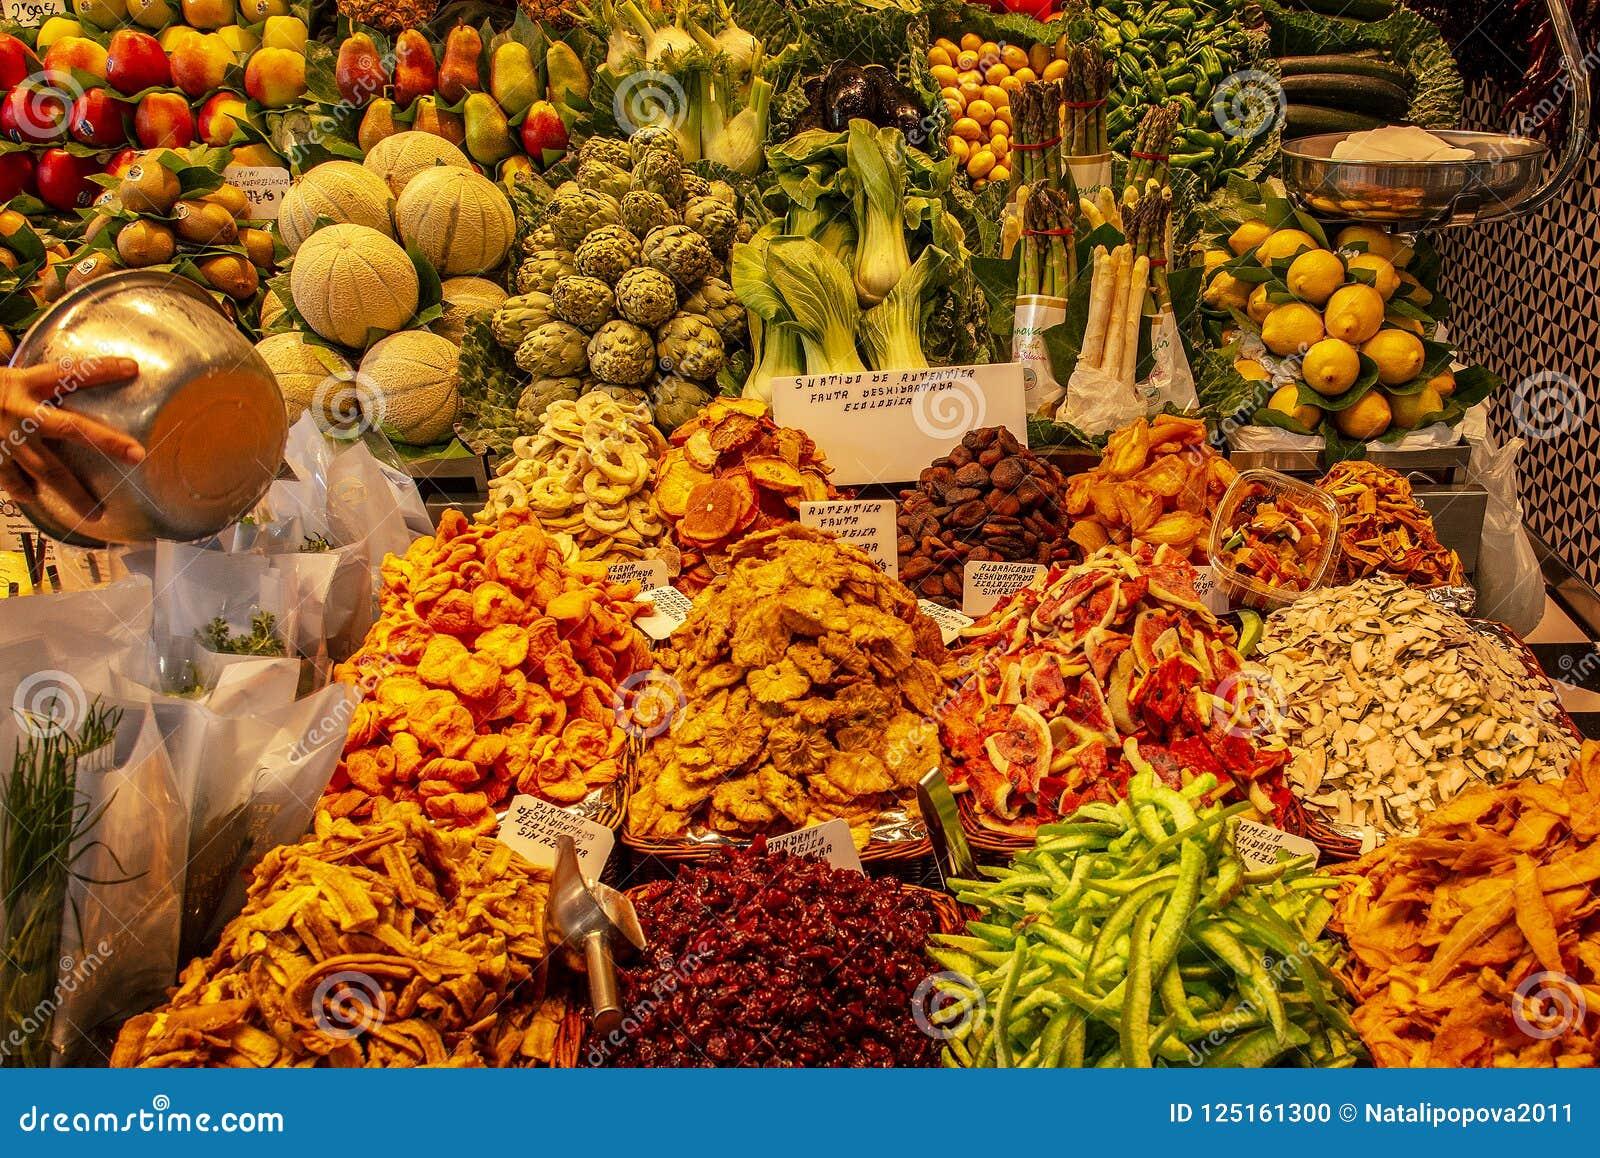 BARCELONA, SPAIN - May 17, 2018: Famous La Boqueria market with